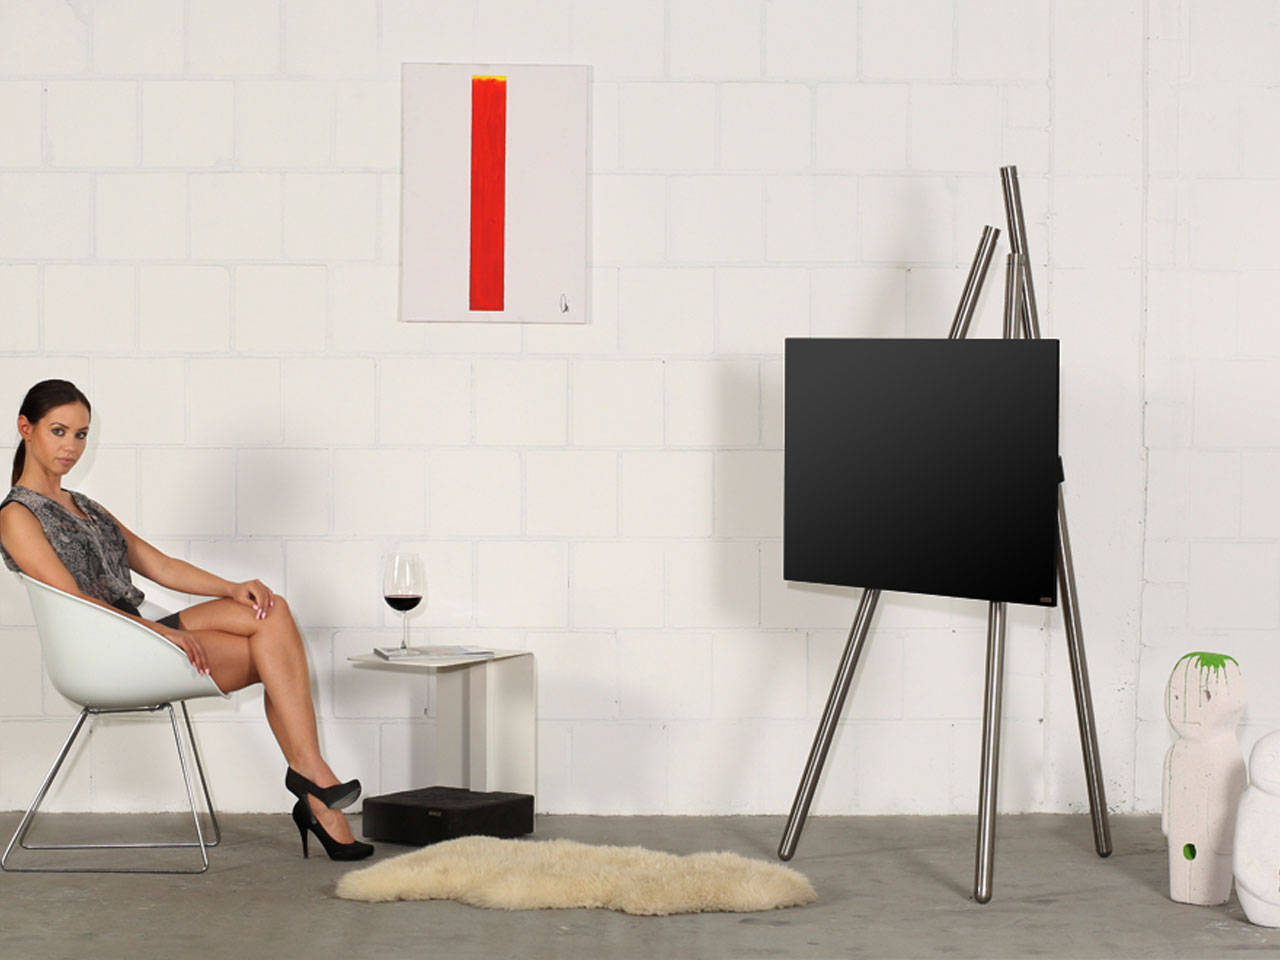 wissmann tv halter tv halter solution art121 produktdesign wissmann raumobjekte wissmann tv. Black Bedroom Furniture Sets. Home Design Ideas